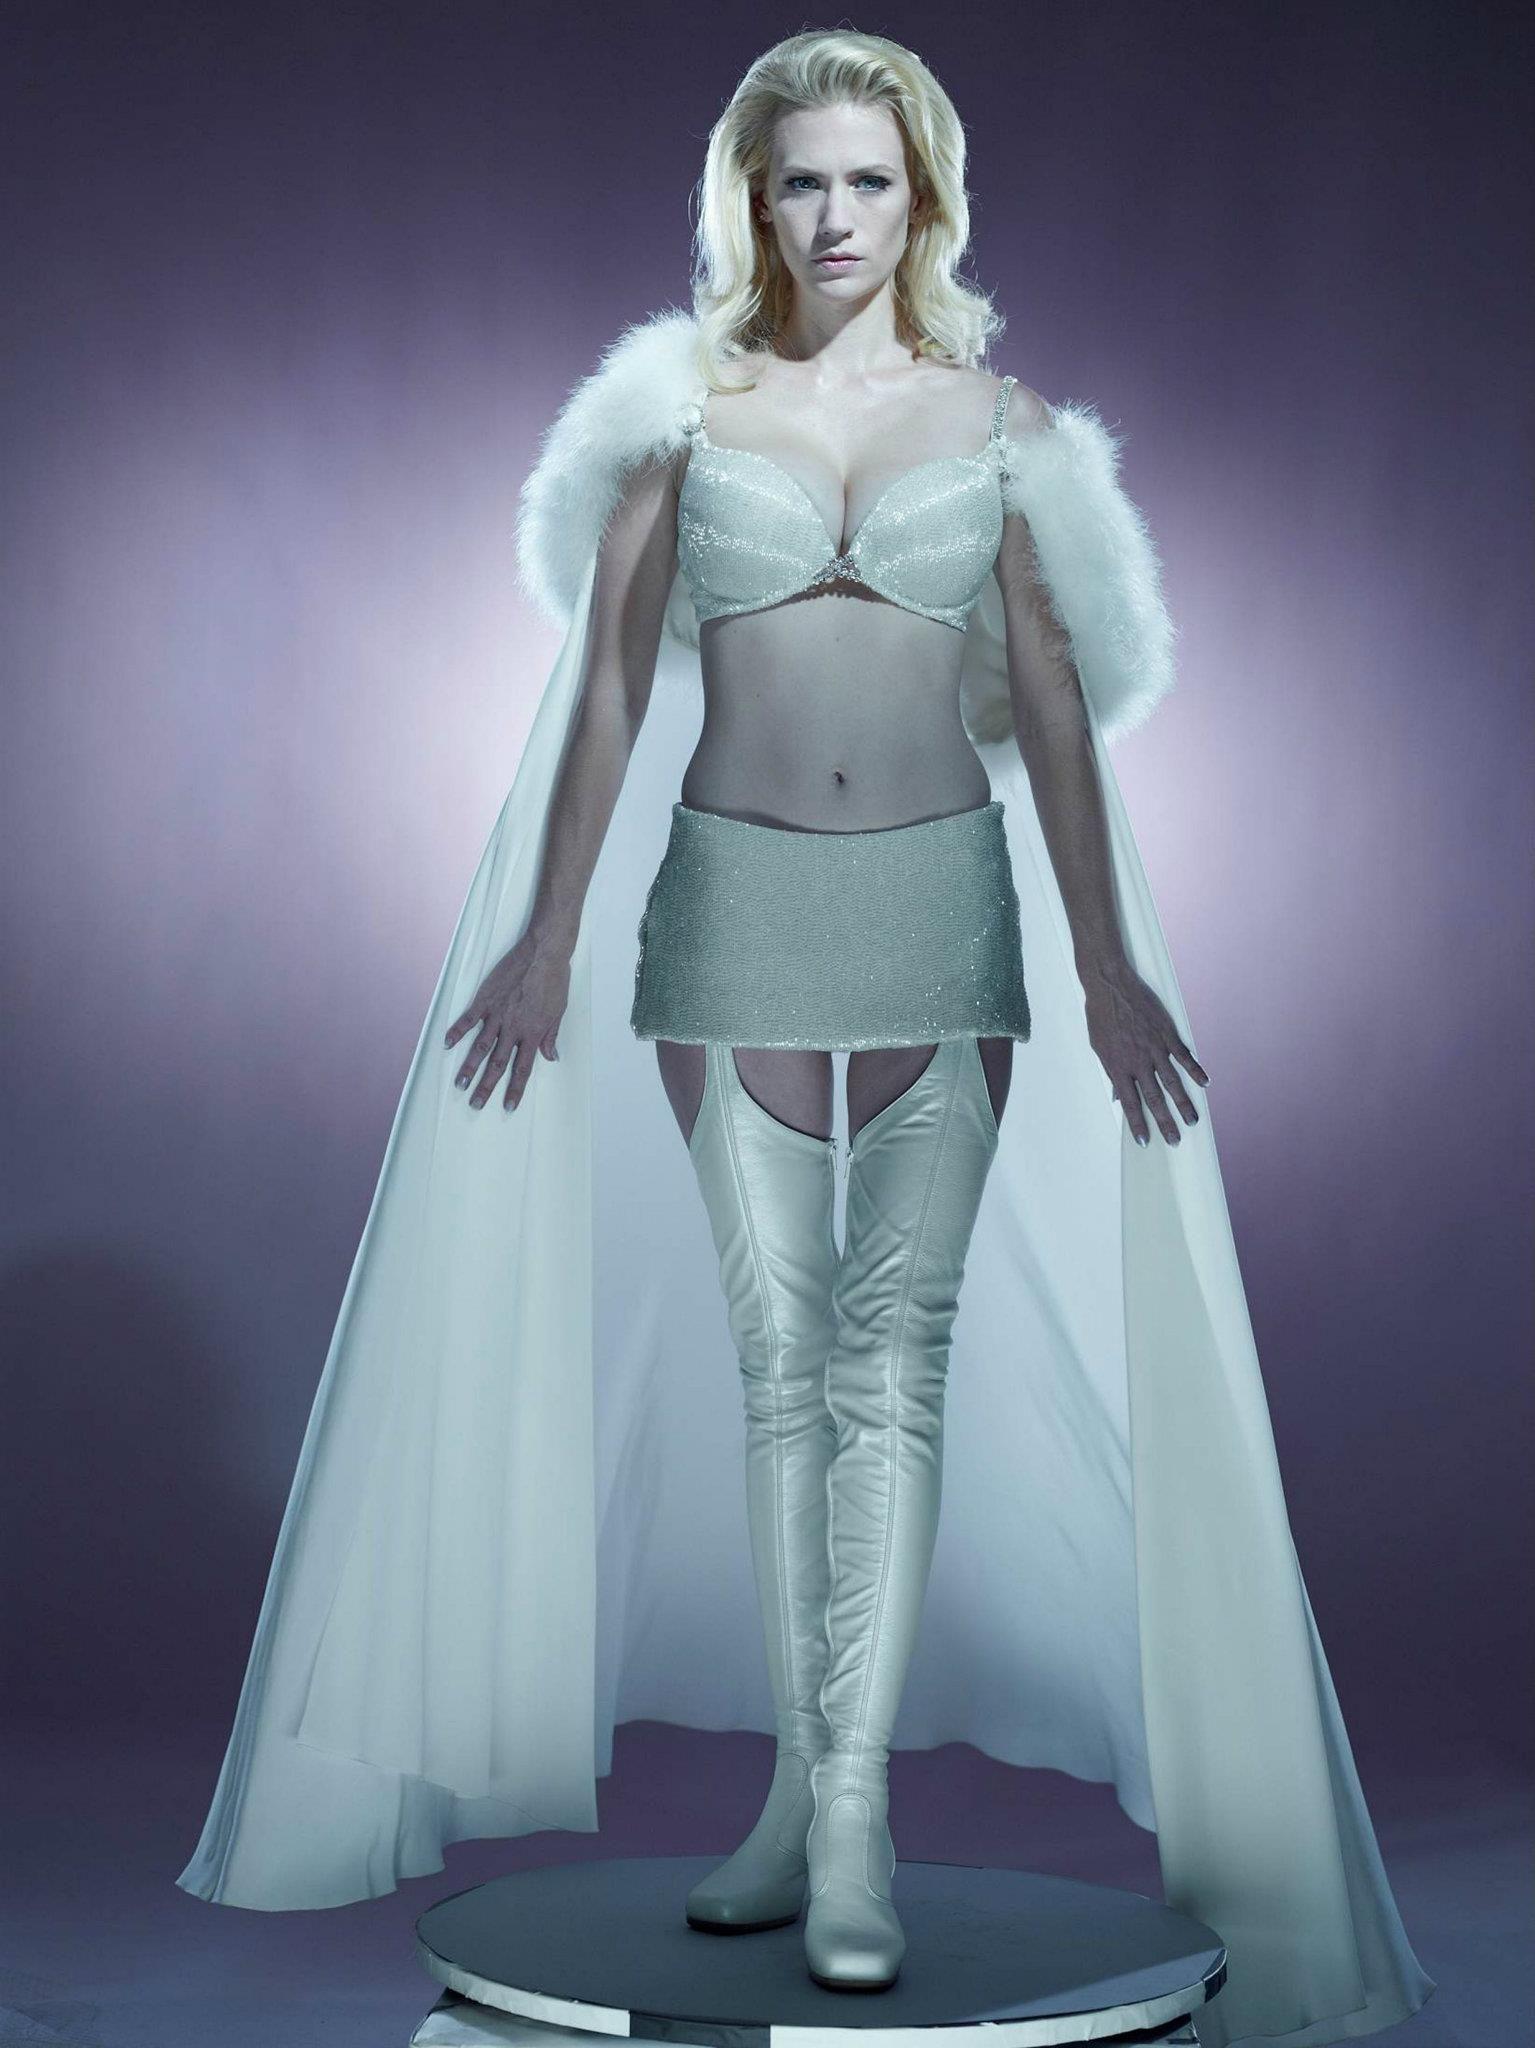 Groovy Emma Frost January Jones Filmes De Super Herois Super Hero Hairstyles For Women Draintrainus